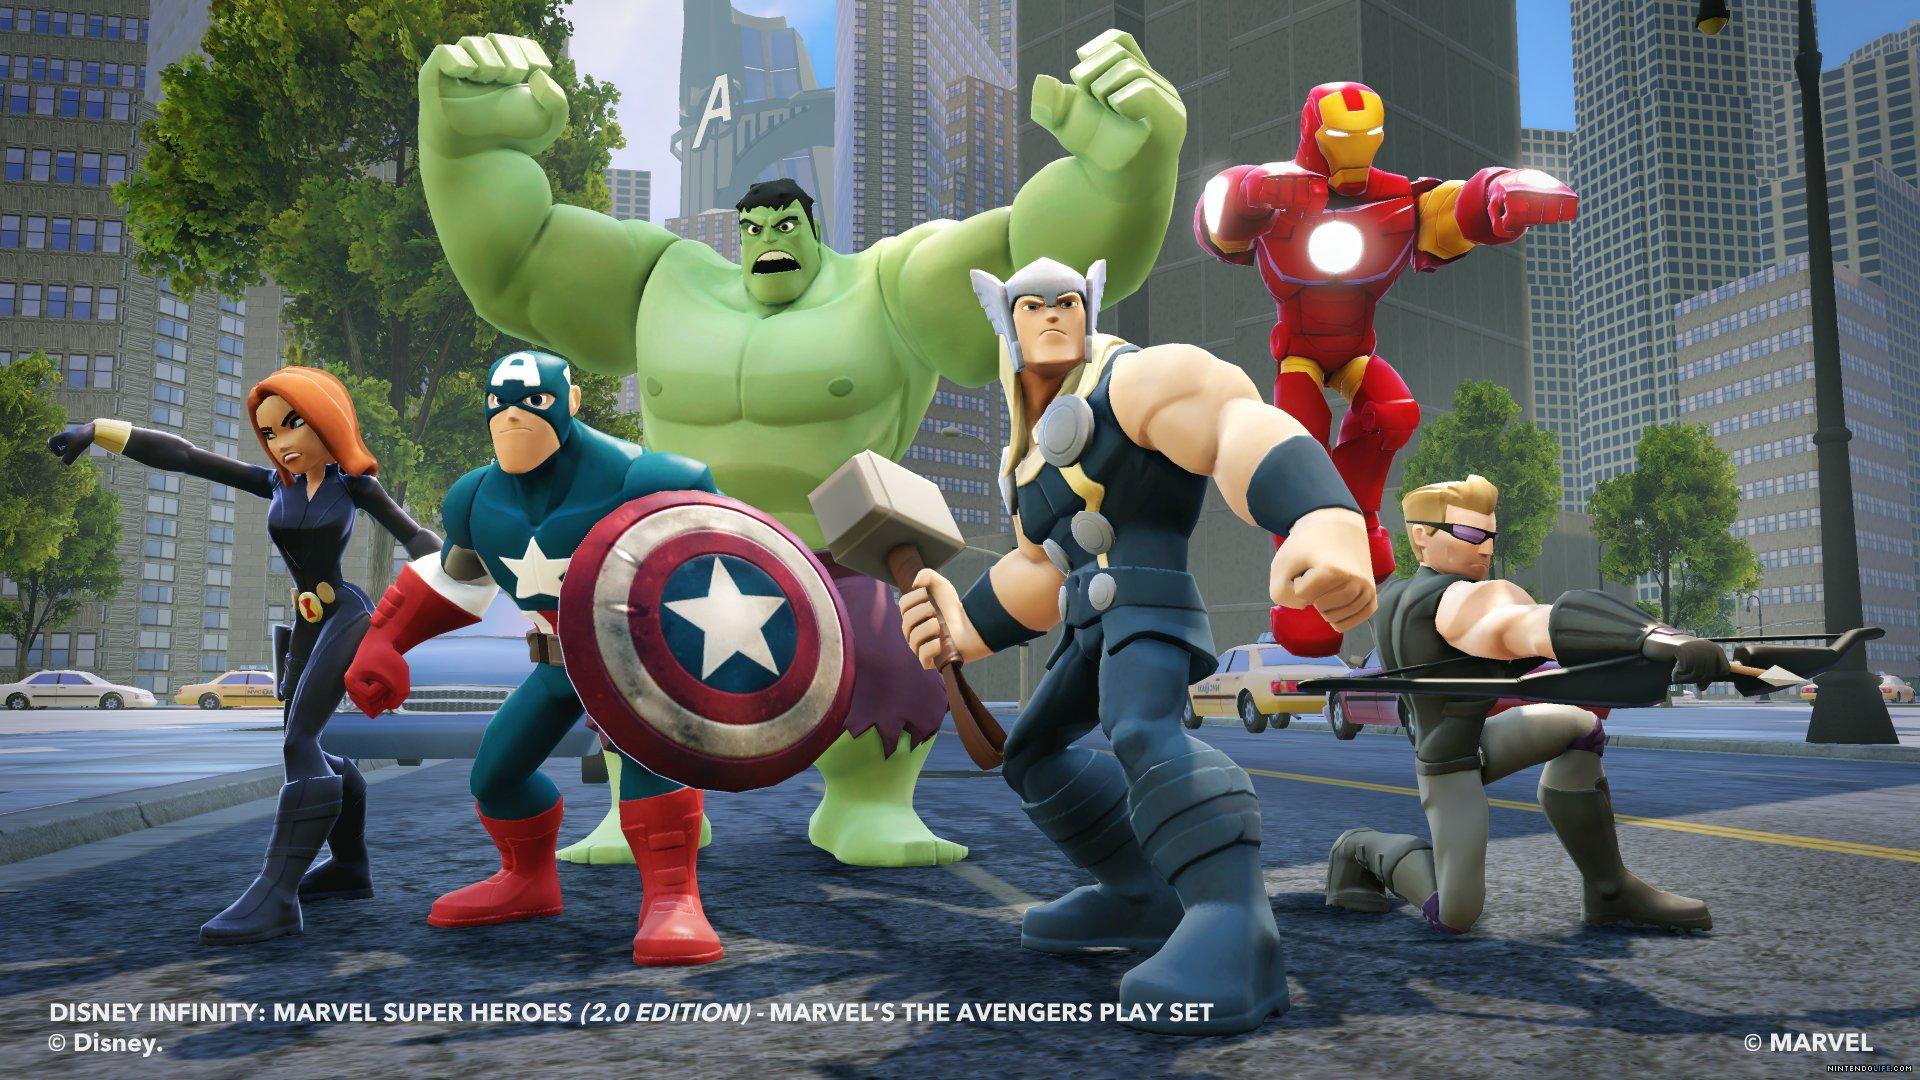 Wreck it ralph disney infinity wiki fandom powered by - Disney Infinity Avengers Jpg